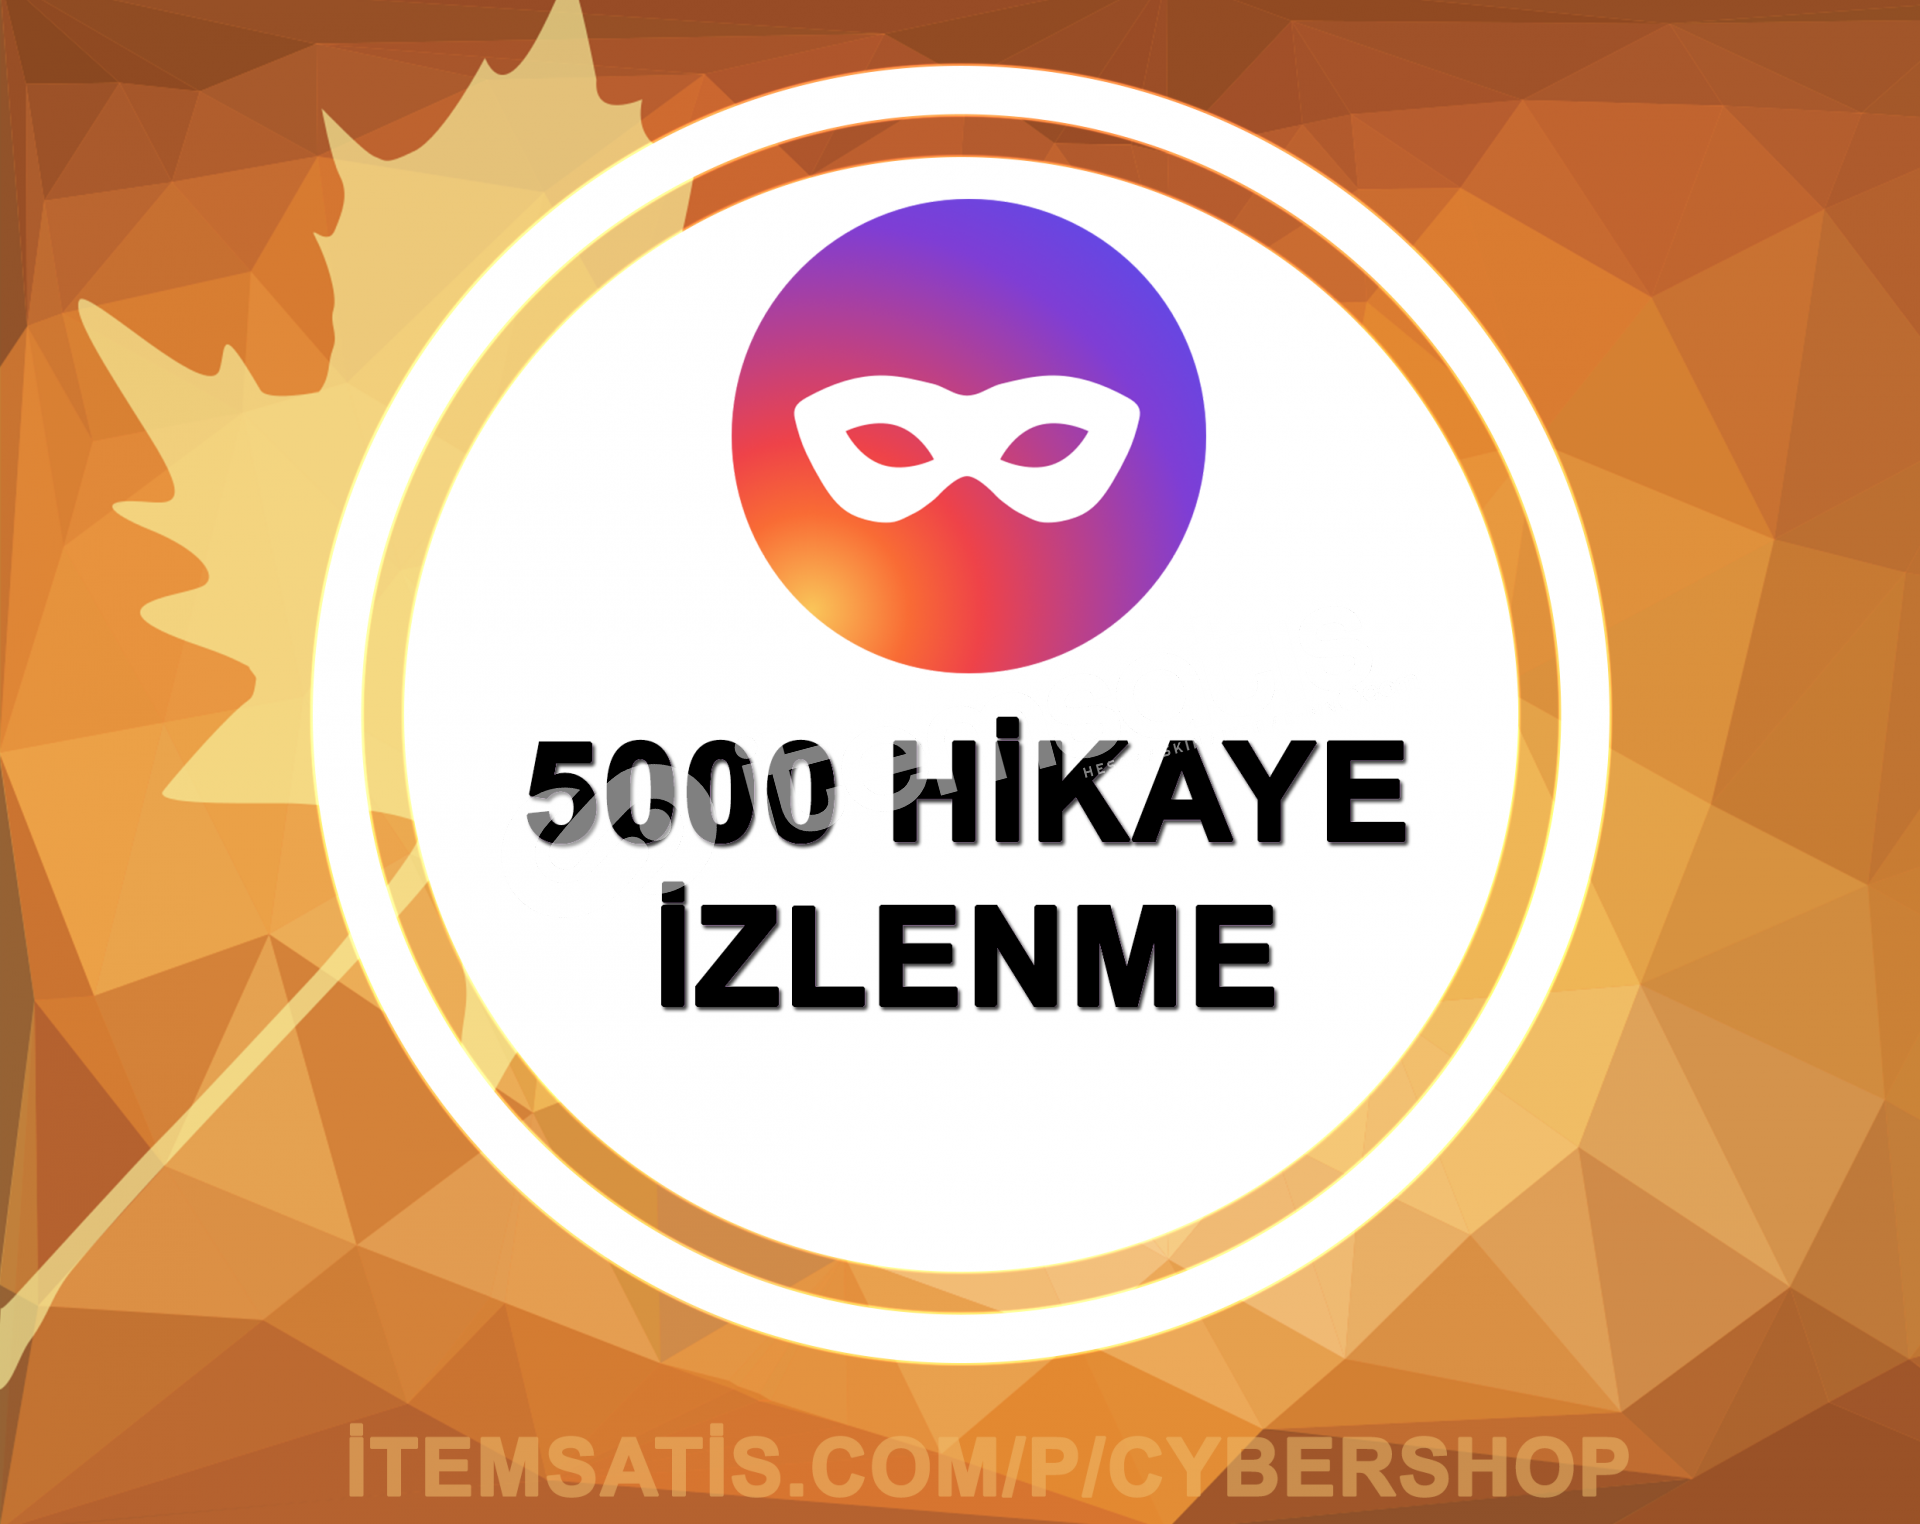 5000 Hikaye İzlenme (Tüm Hikayeler)